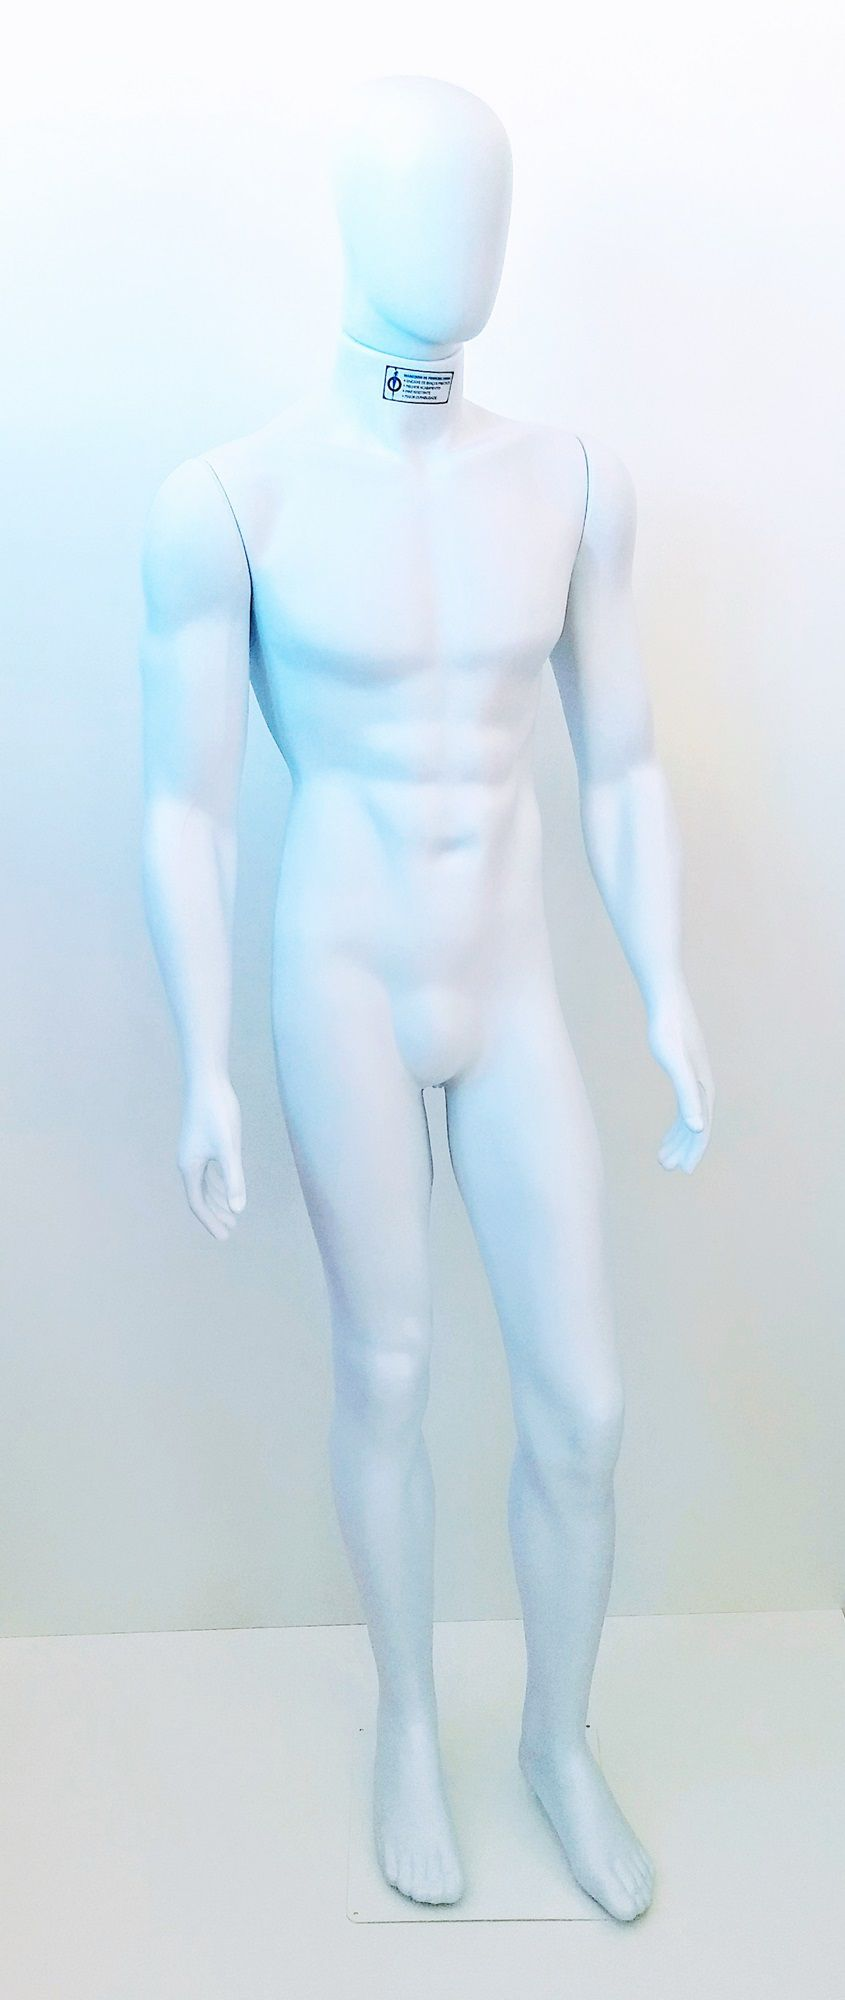 Manequim Masculino Bombado Ovo Branco com Base